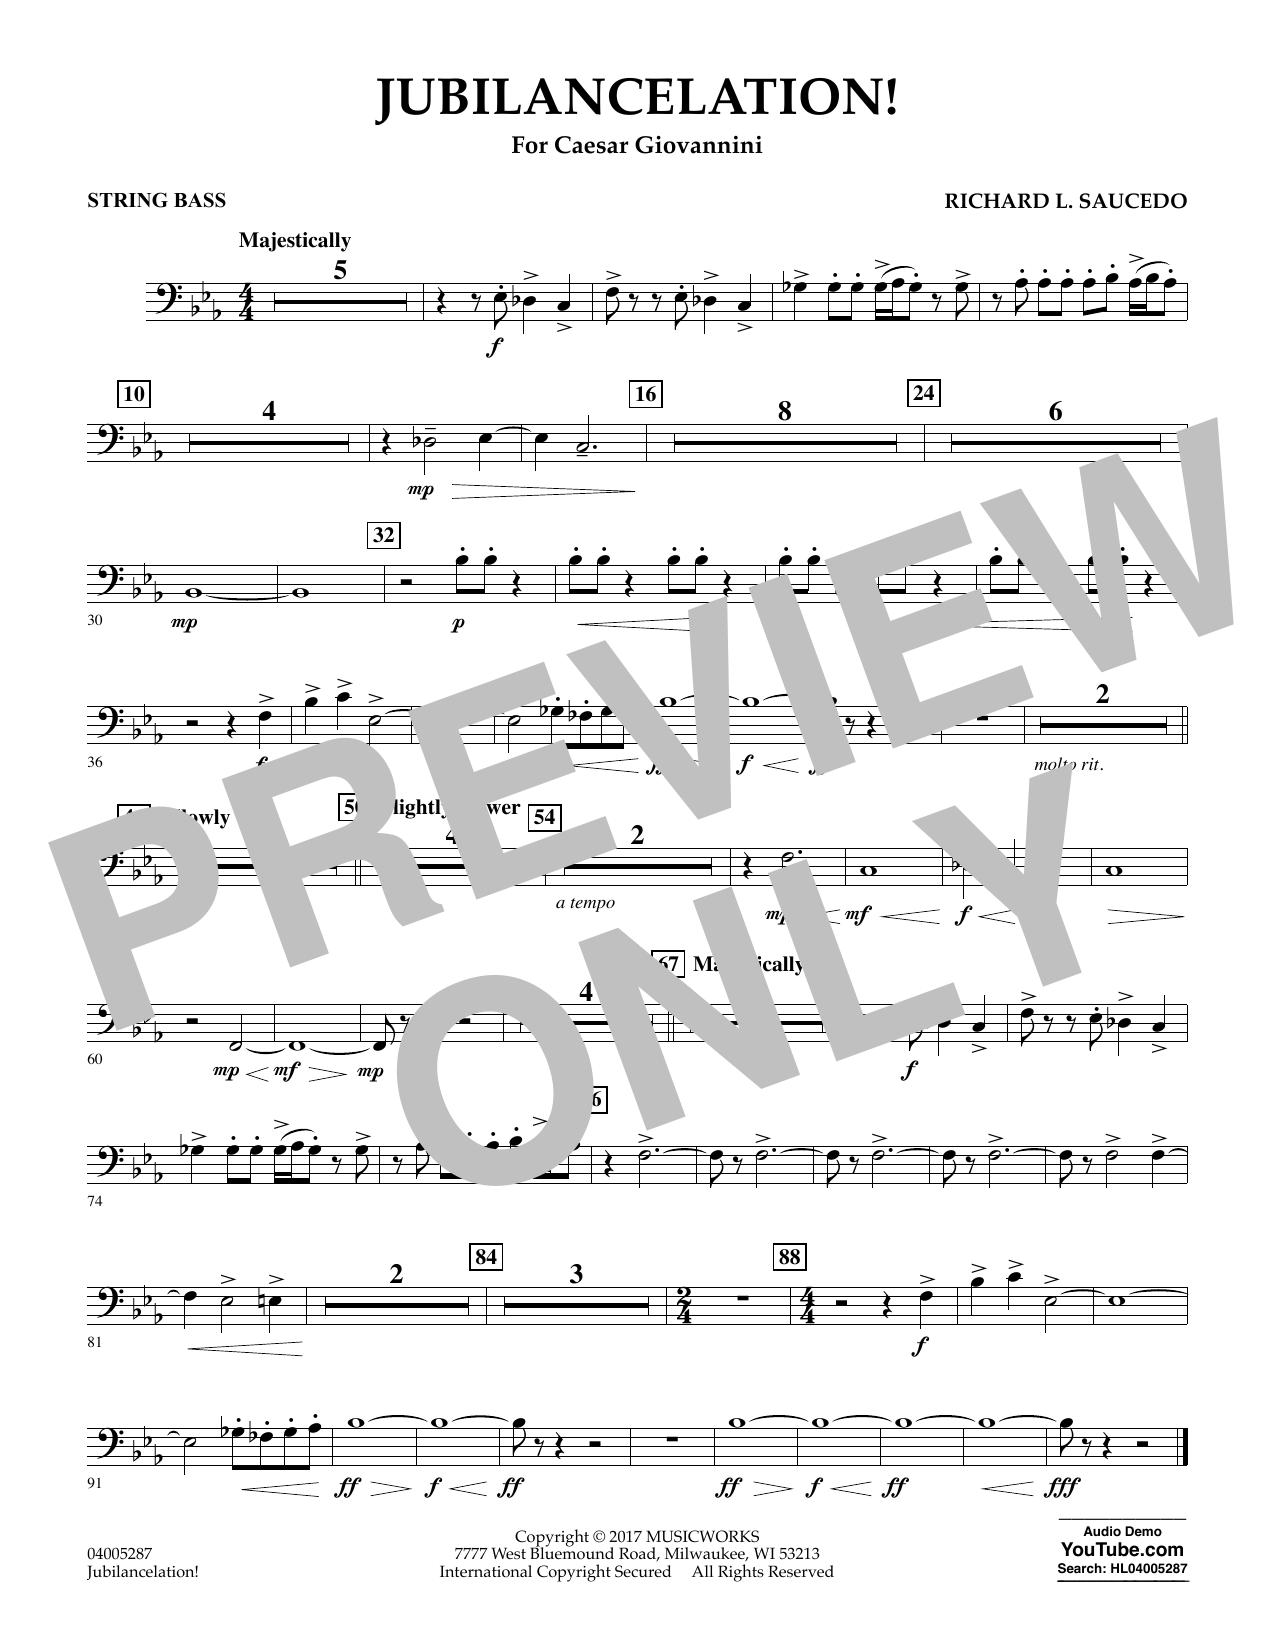 Jubilancelation! - String Bass (Concert Band)